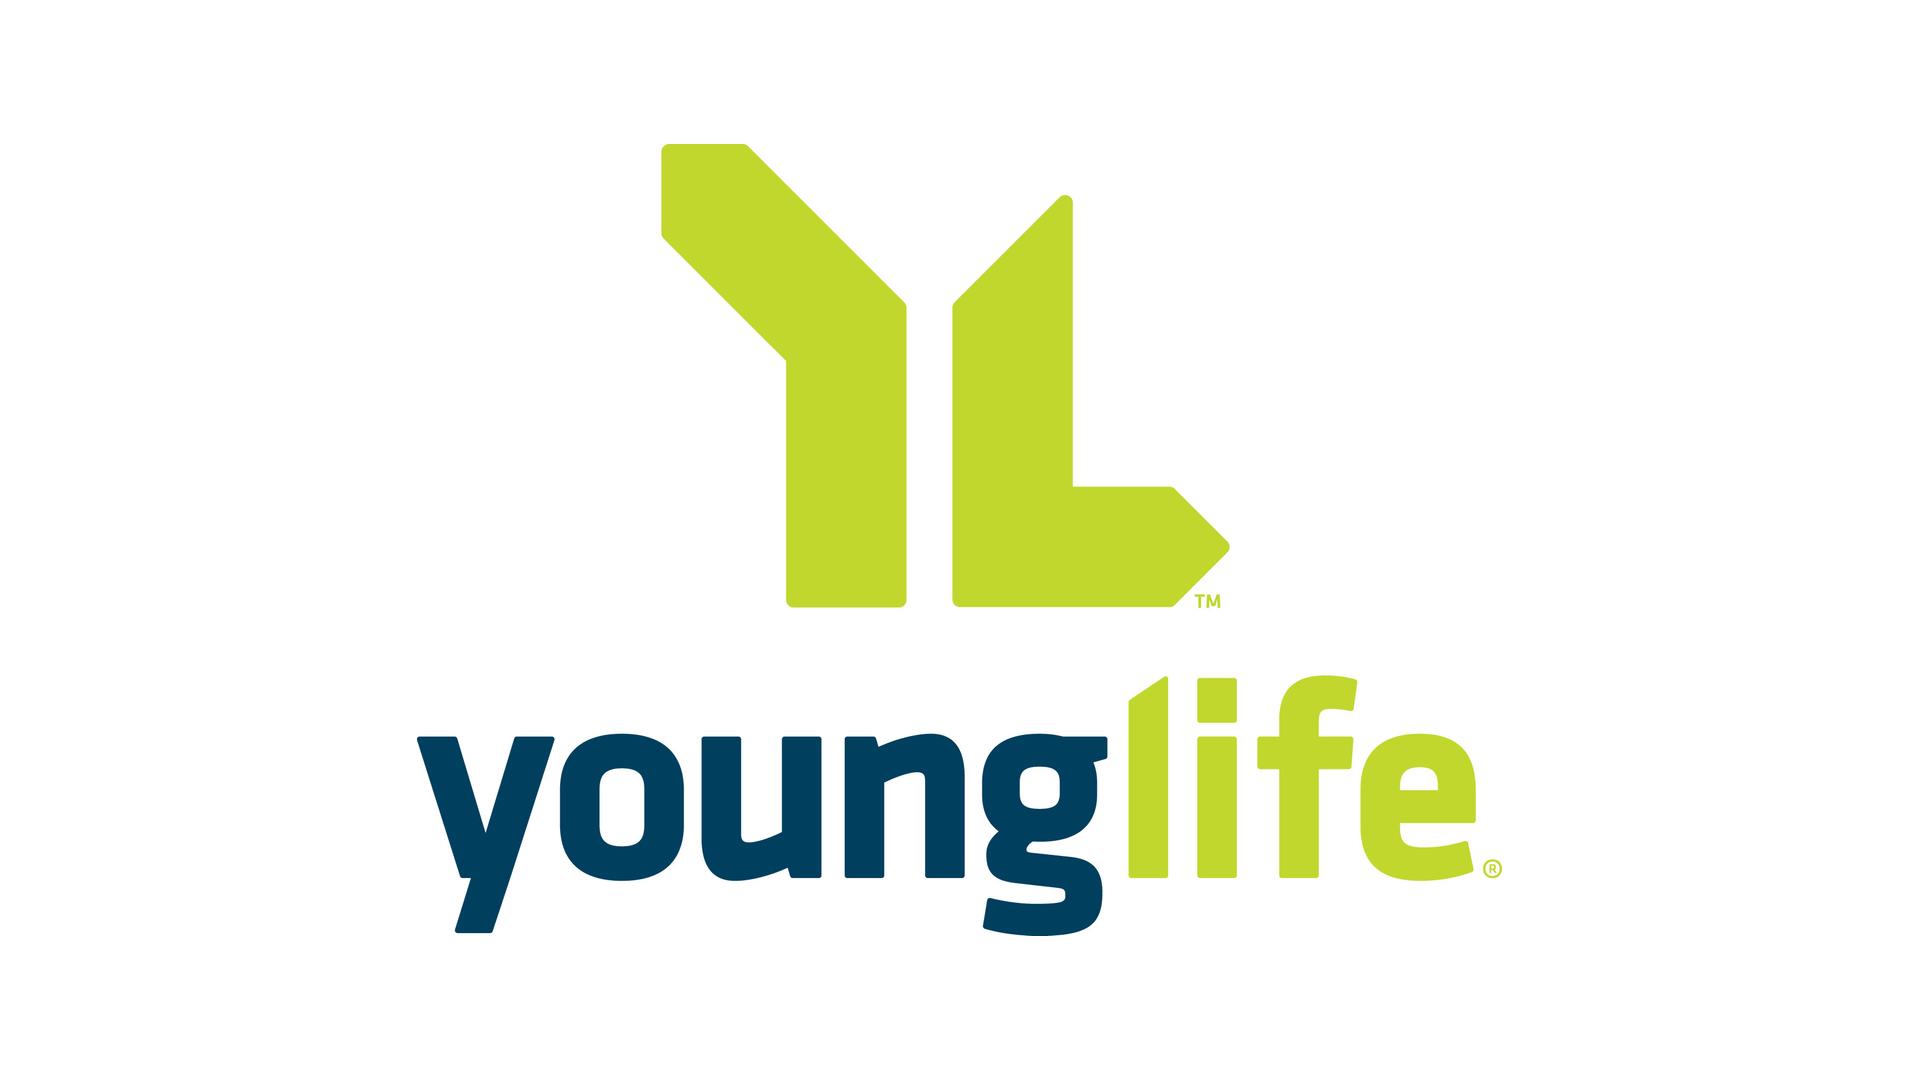 younglife-logo2.jpg